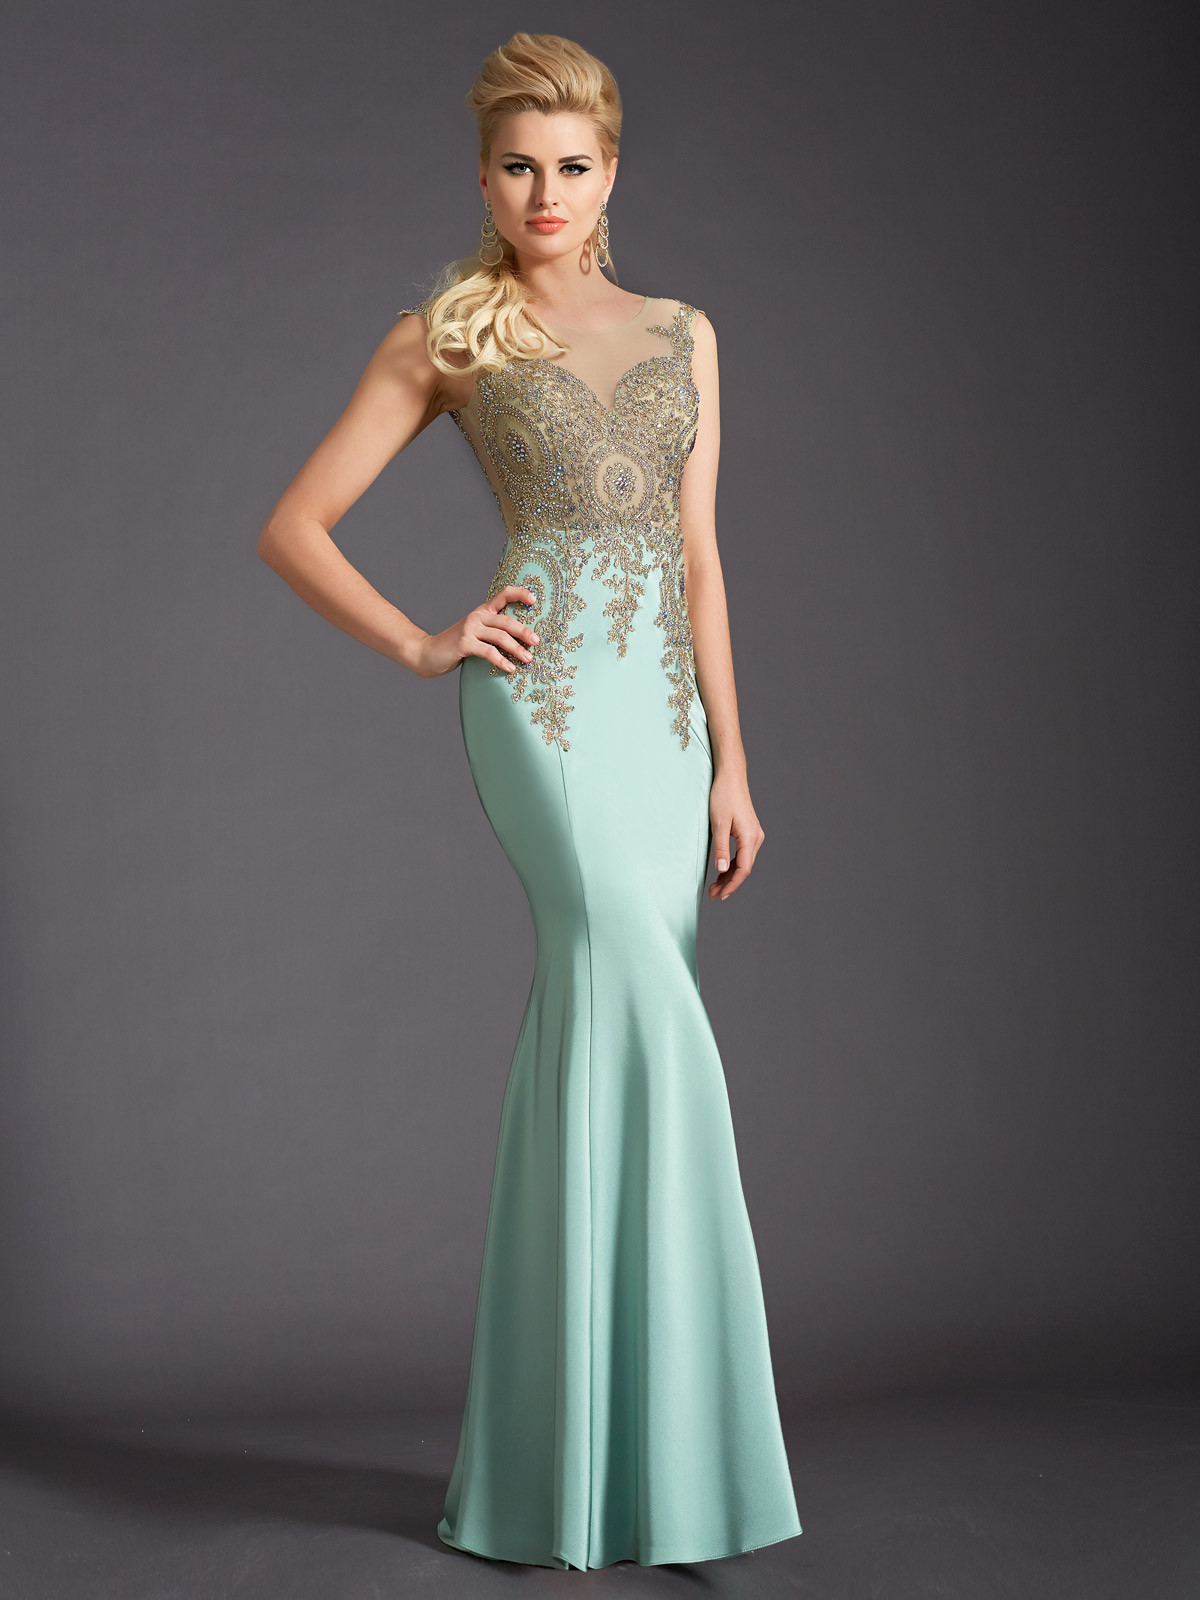 Vestidos largos elegantes de moda